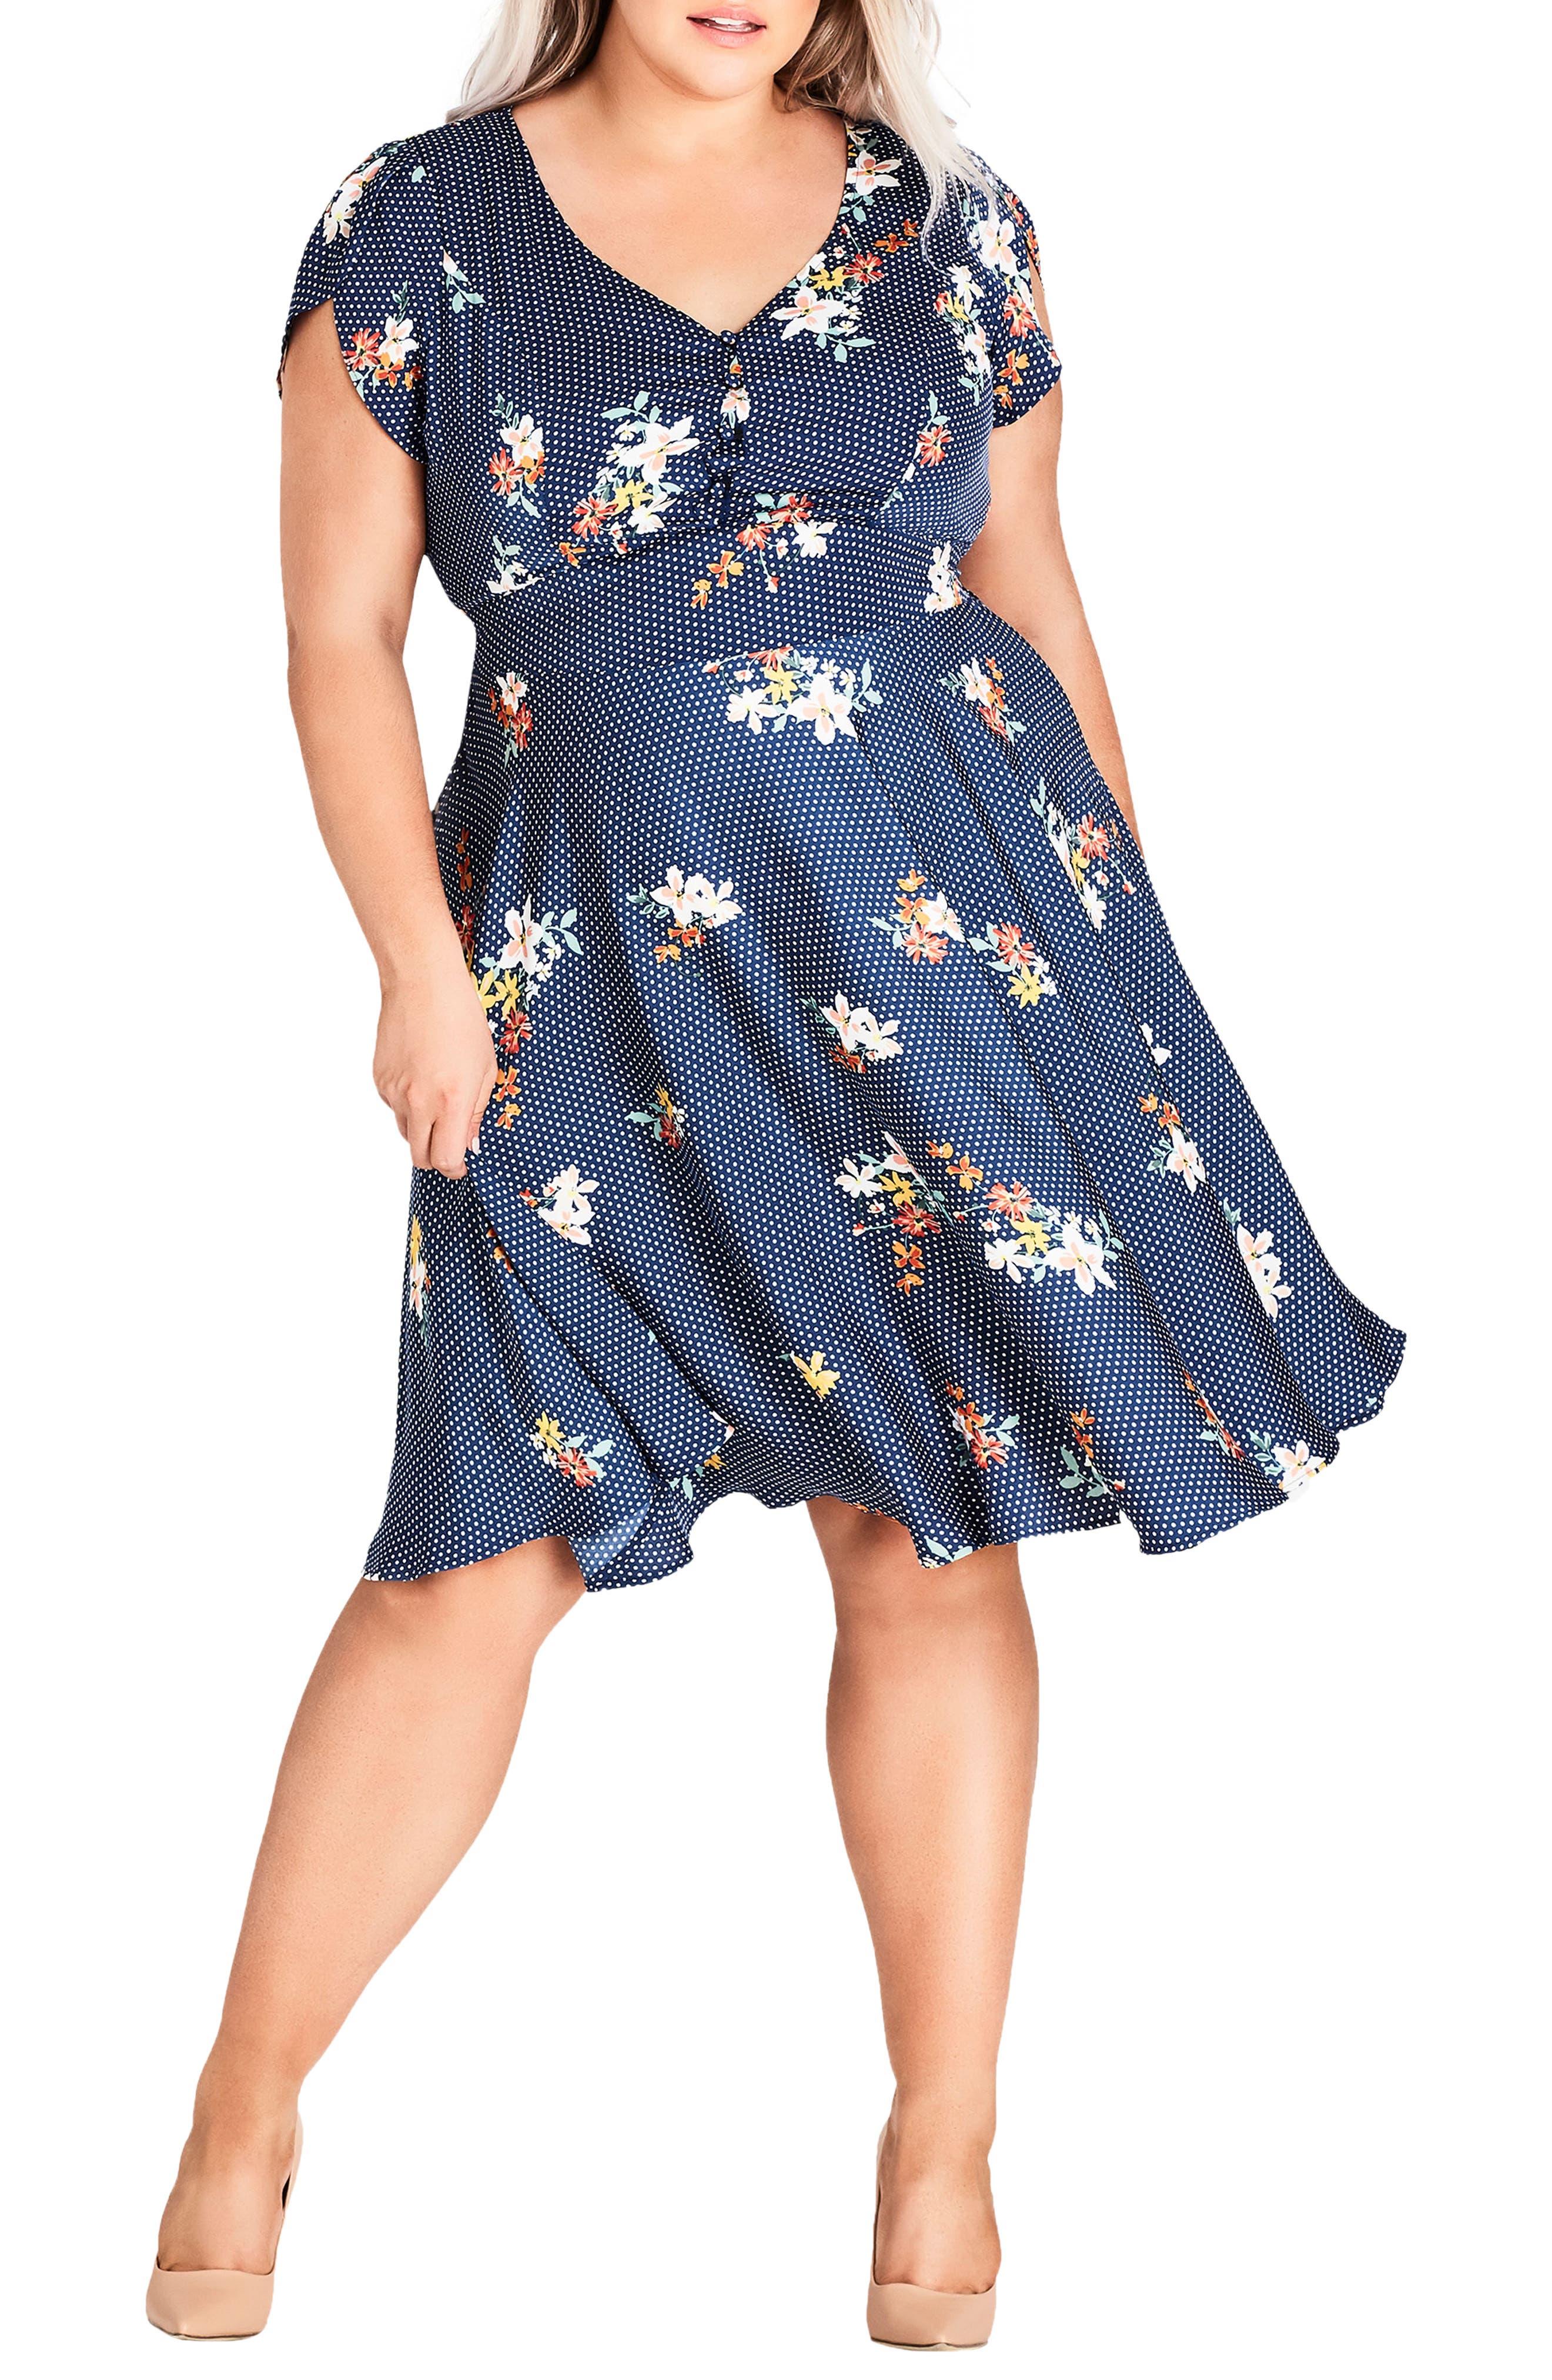 Sweet Spot Floral Fit & Flare Dress,                         Main,                         color, SPOT THE FLORAL